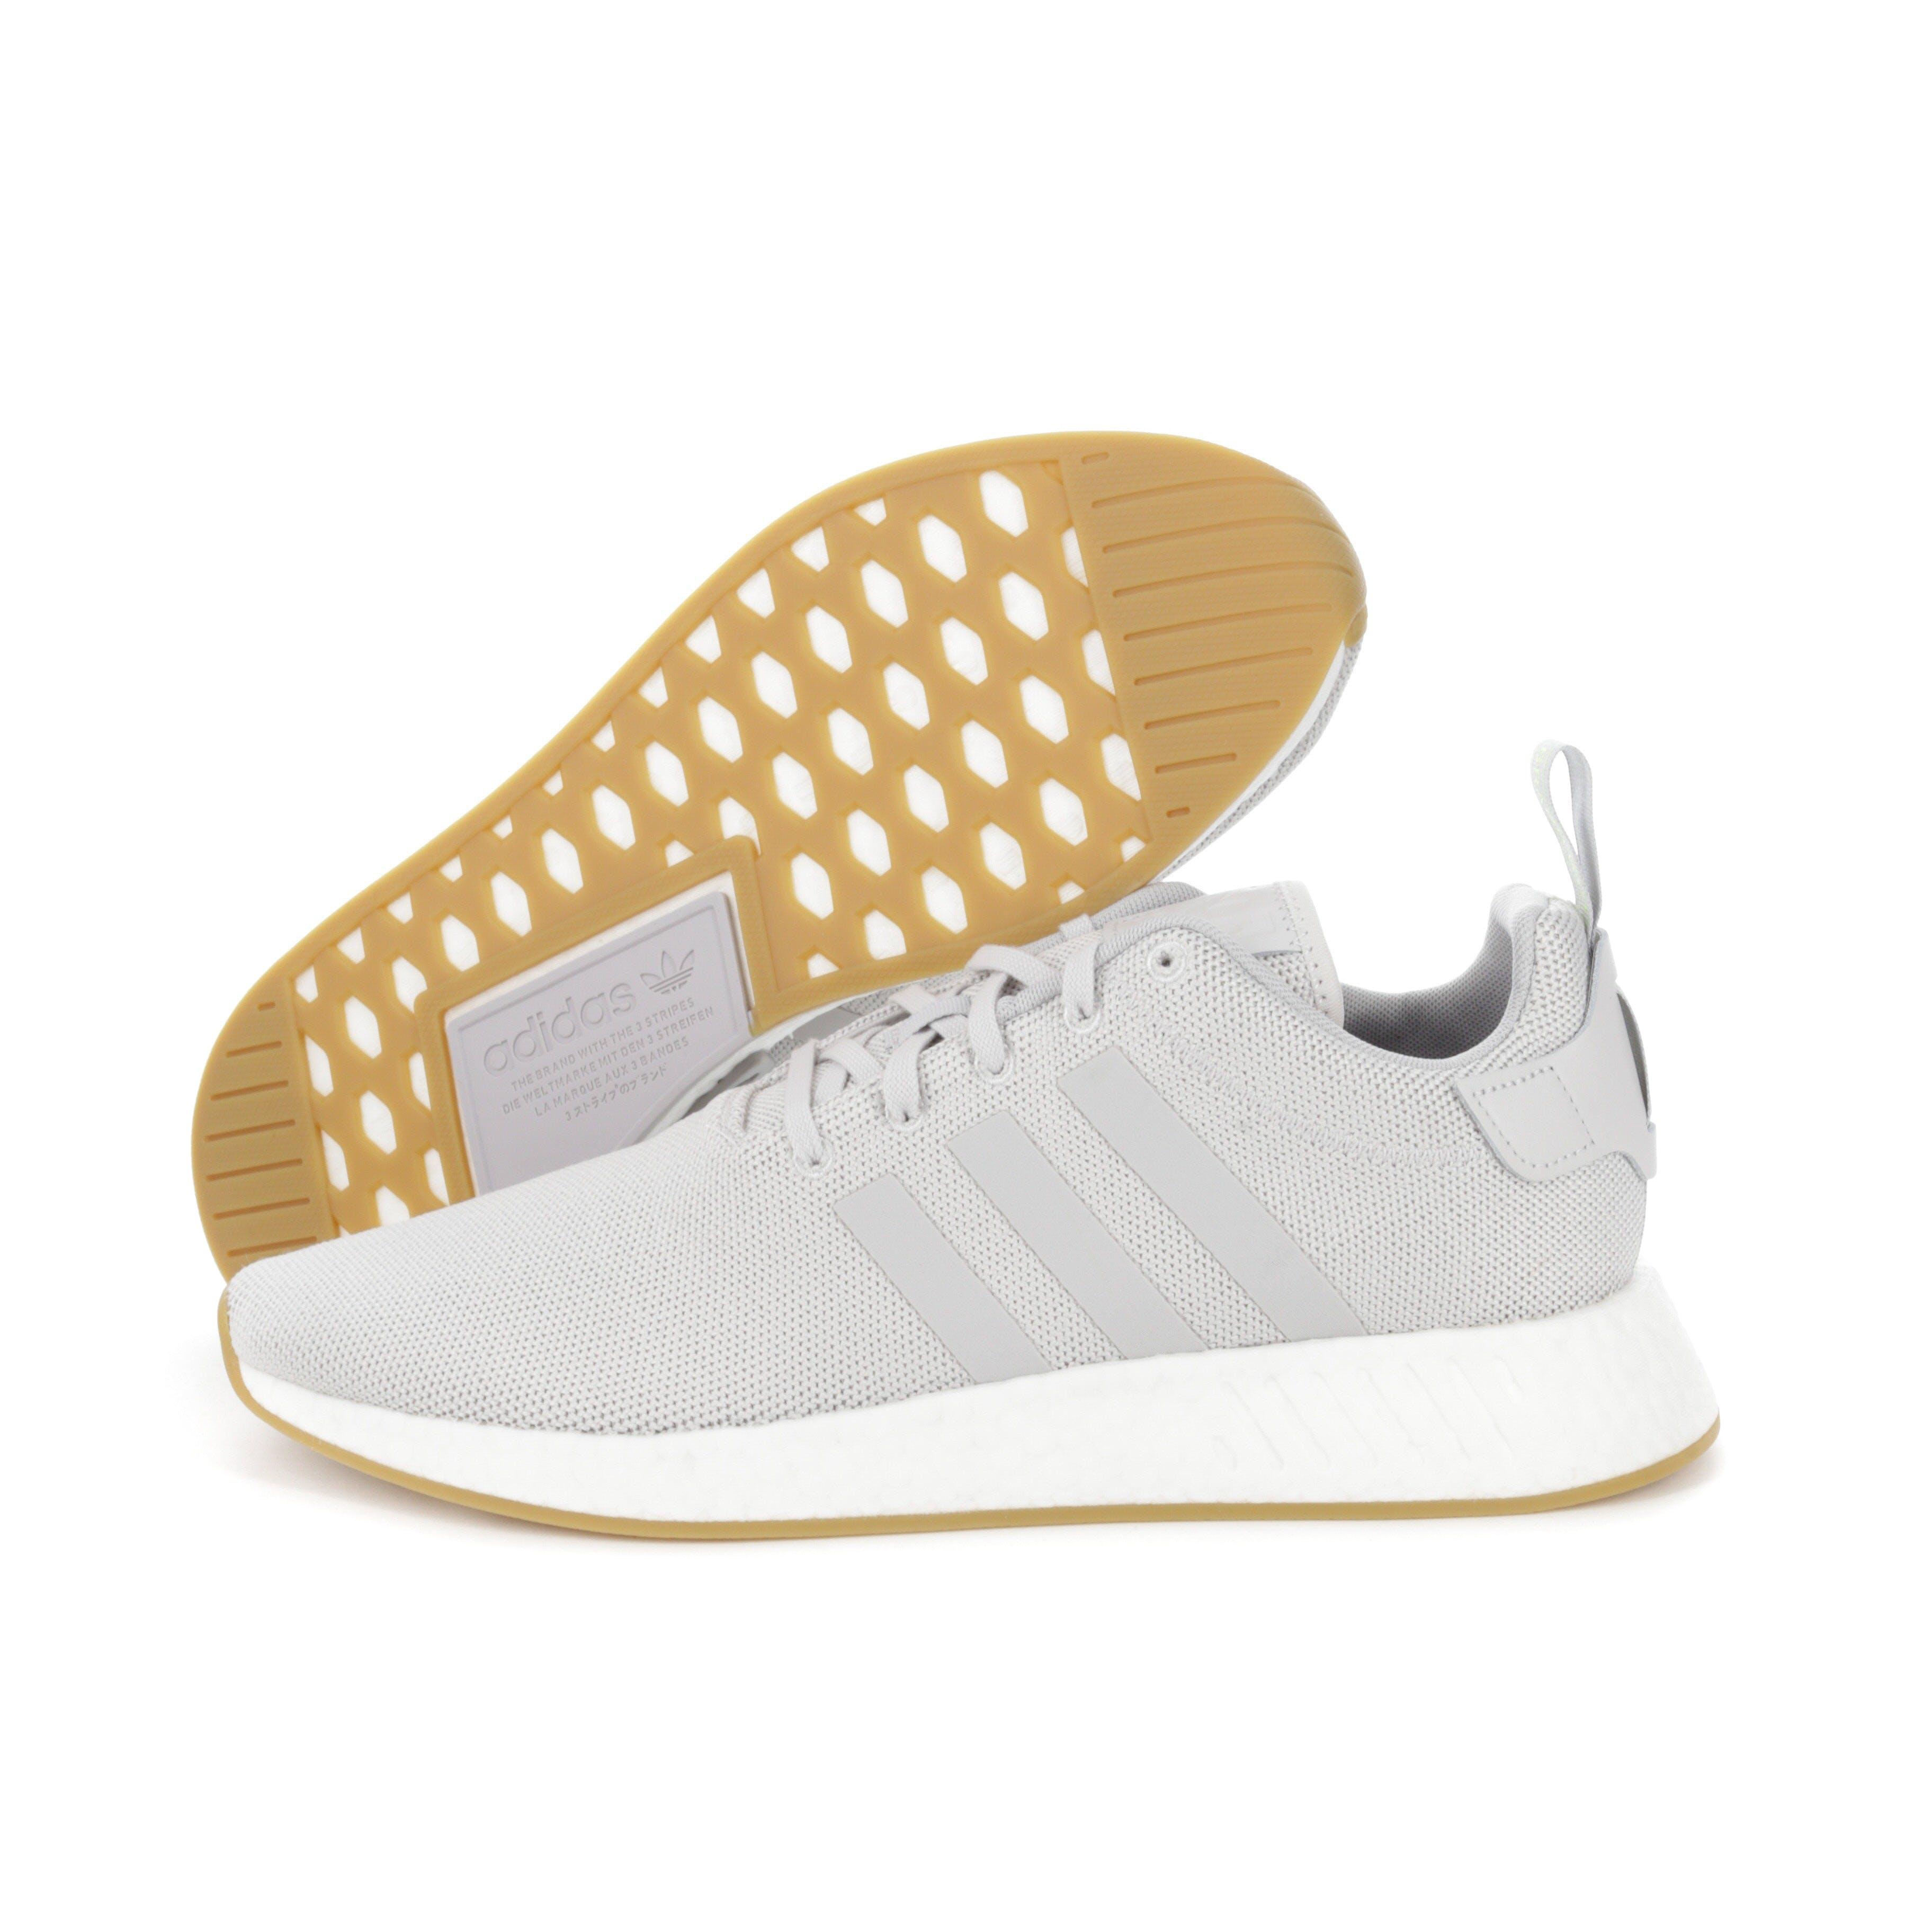 Adidas Nmd R2 Grey White Gum Culture Kings